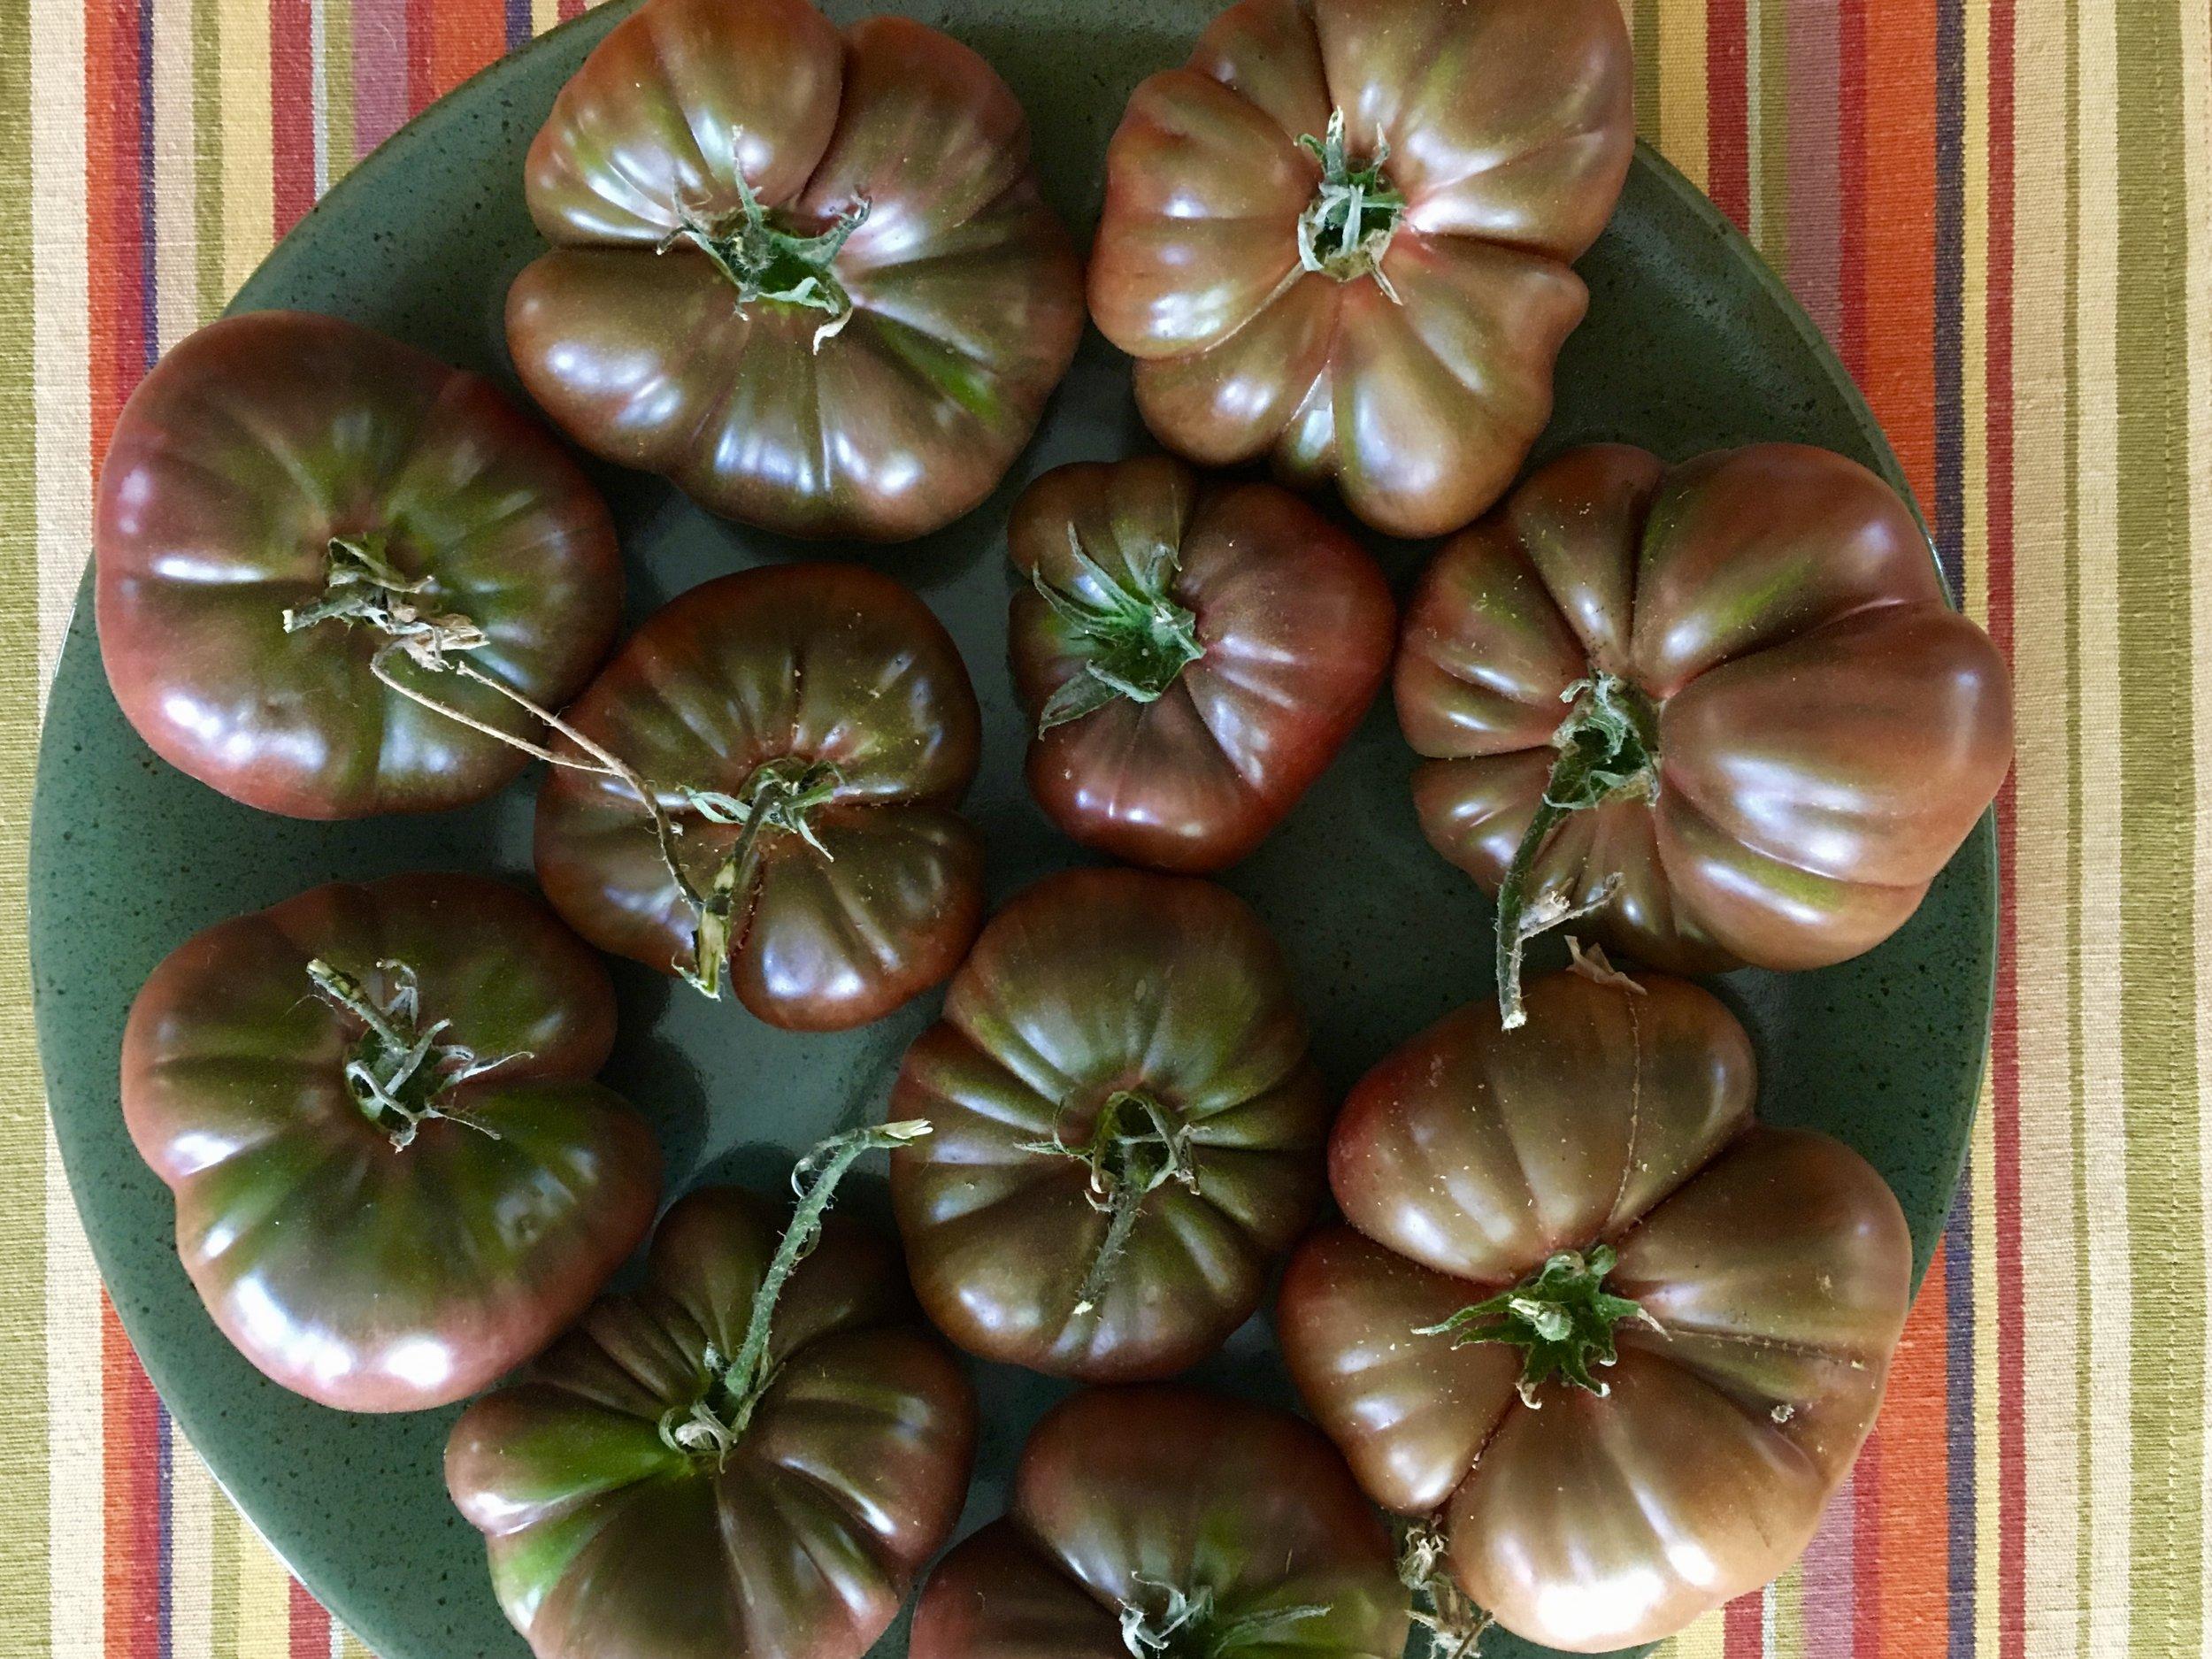 'Black Krim' tomatoes